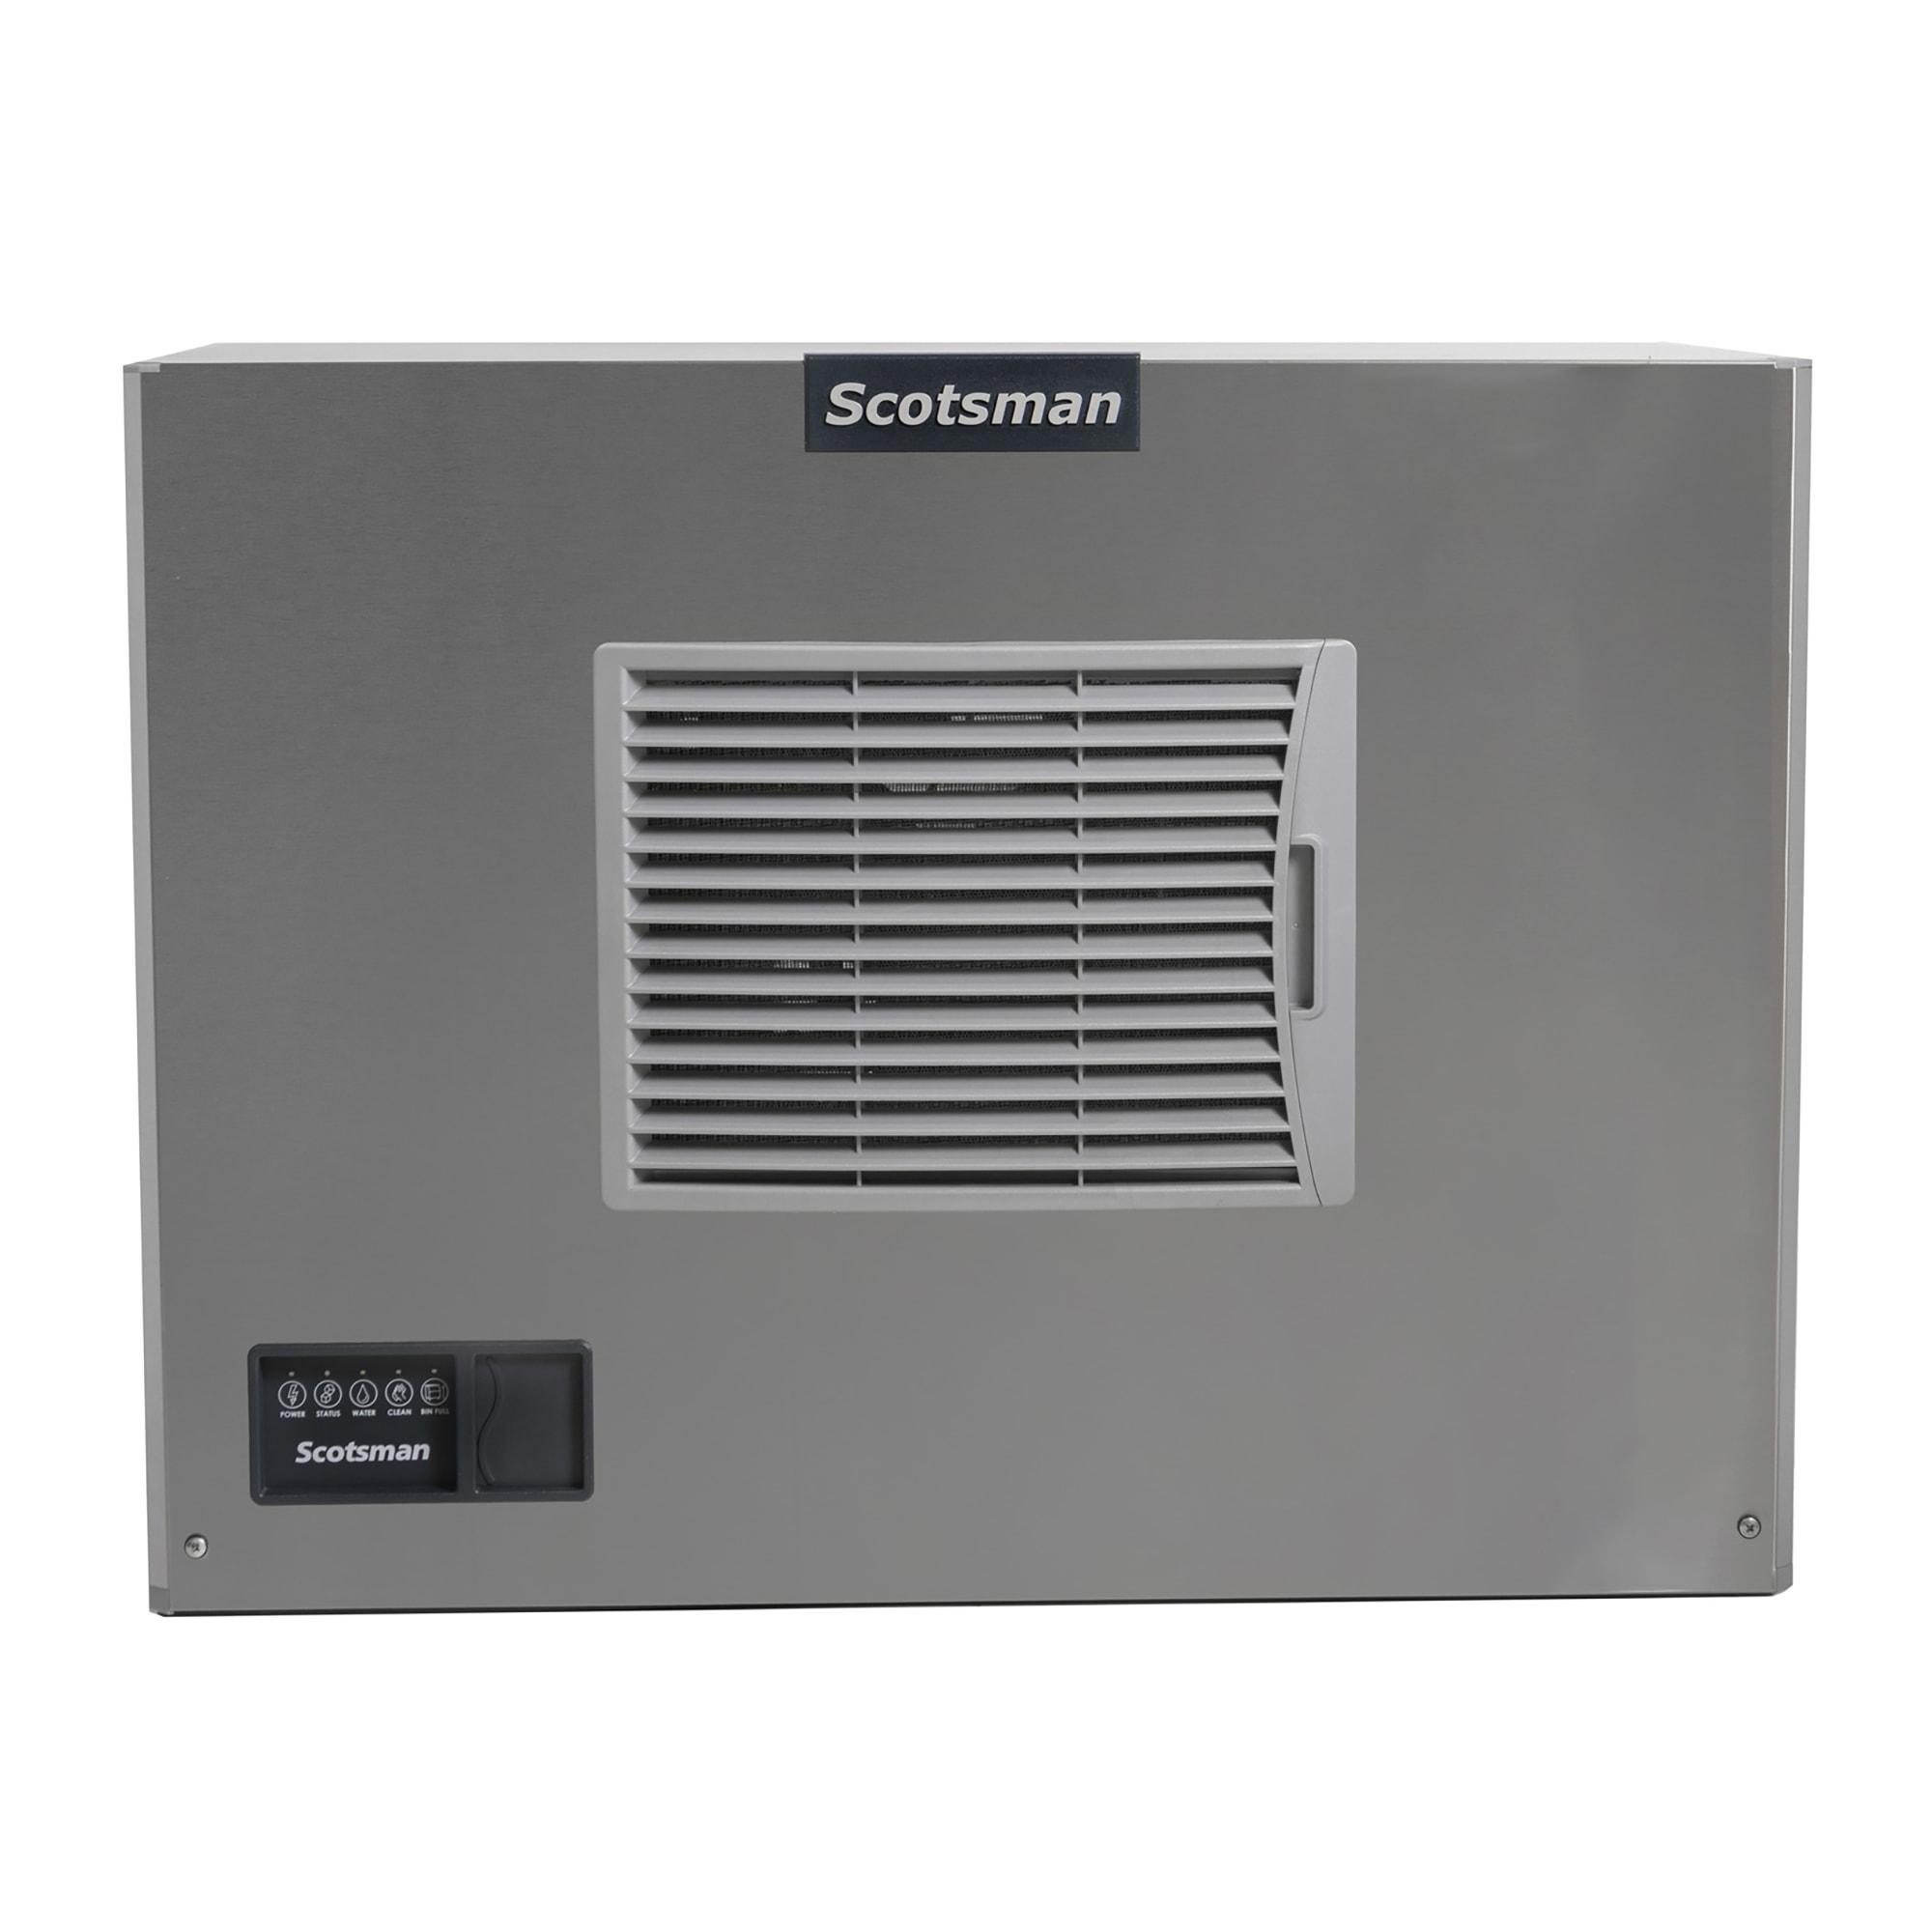 "Scotsman C0330MA-1 30"" Prodigy Plus® Full Cube Ice Machine Head - 400 lb/day, Air Cooled, 115v"